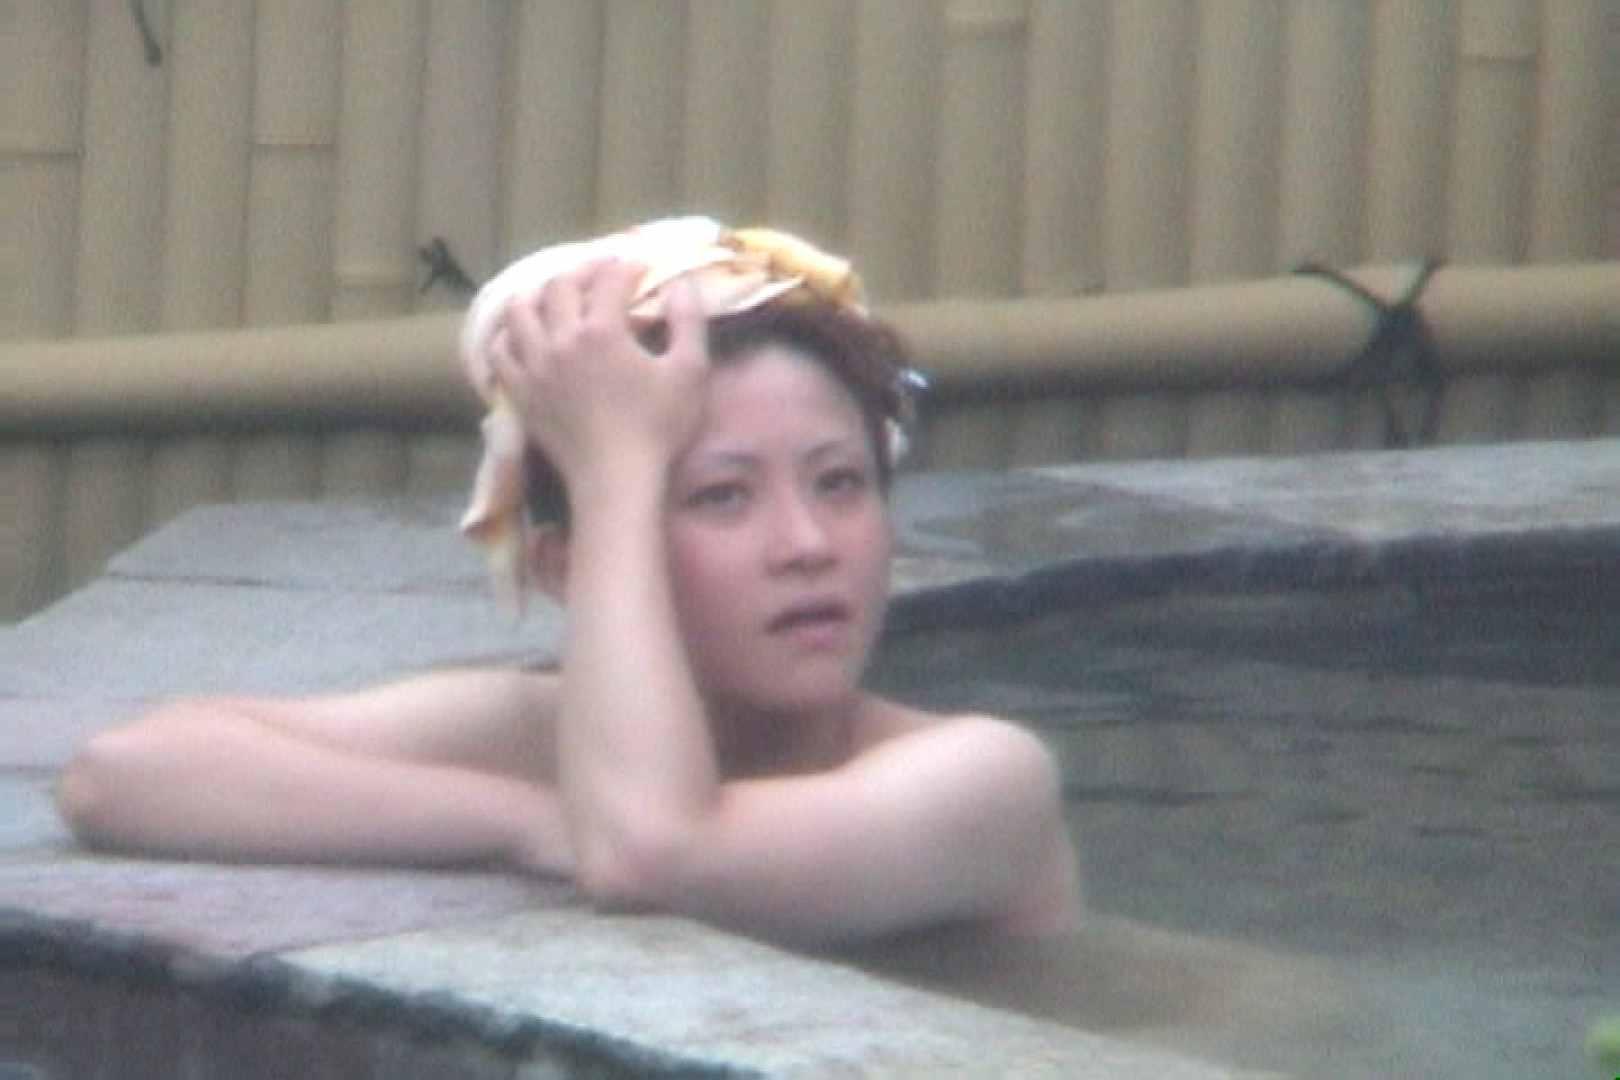 Aquaな露天風呂Vol.48【VIP限定】 盗撮  86pic 39